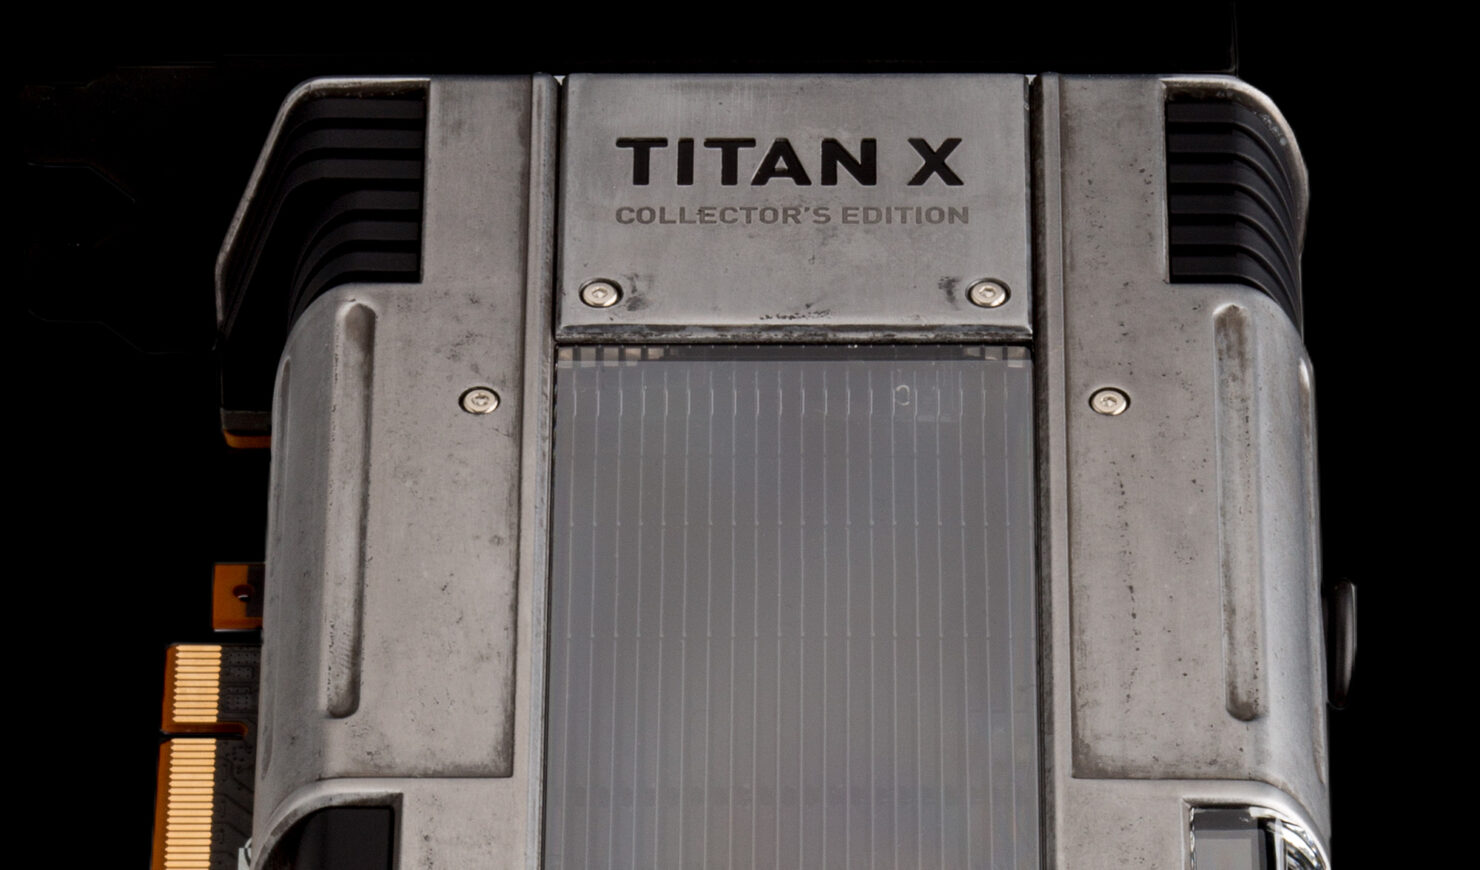 nvidia-titan-xp-ce-star-wars-jedi-order-gallery-01